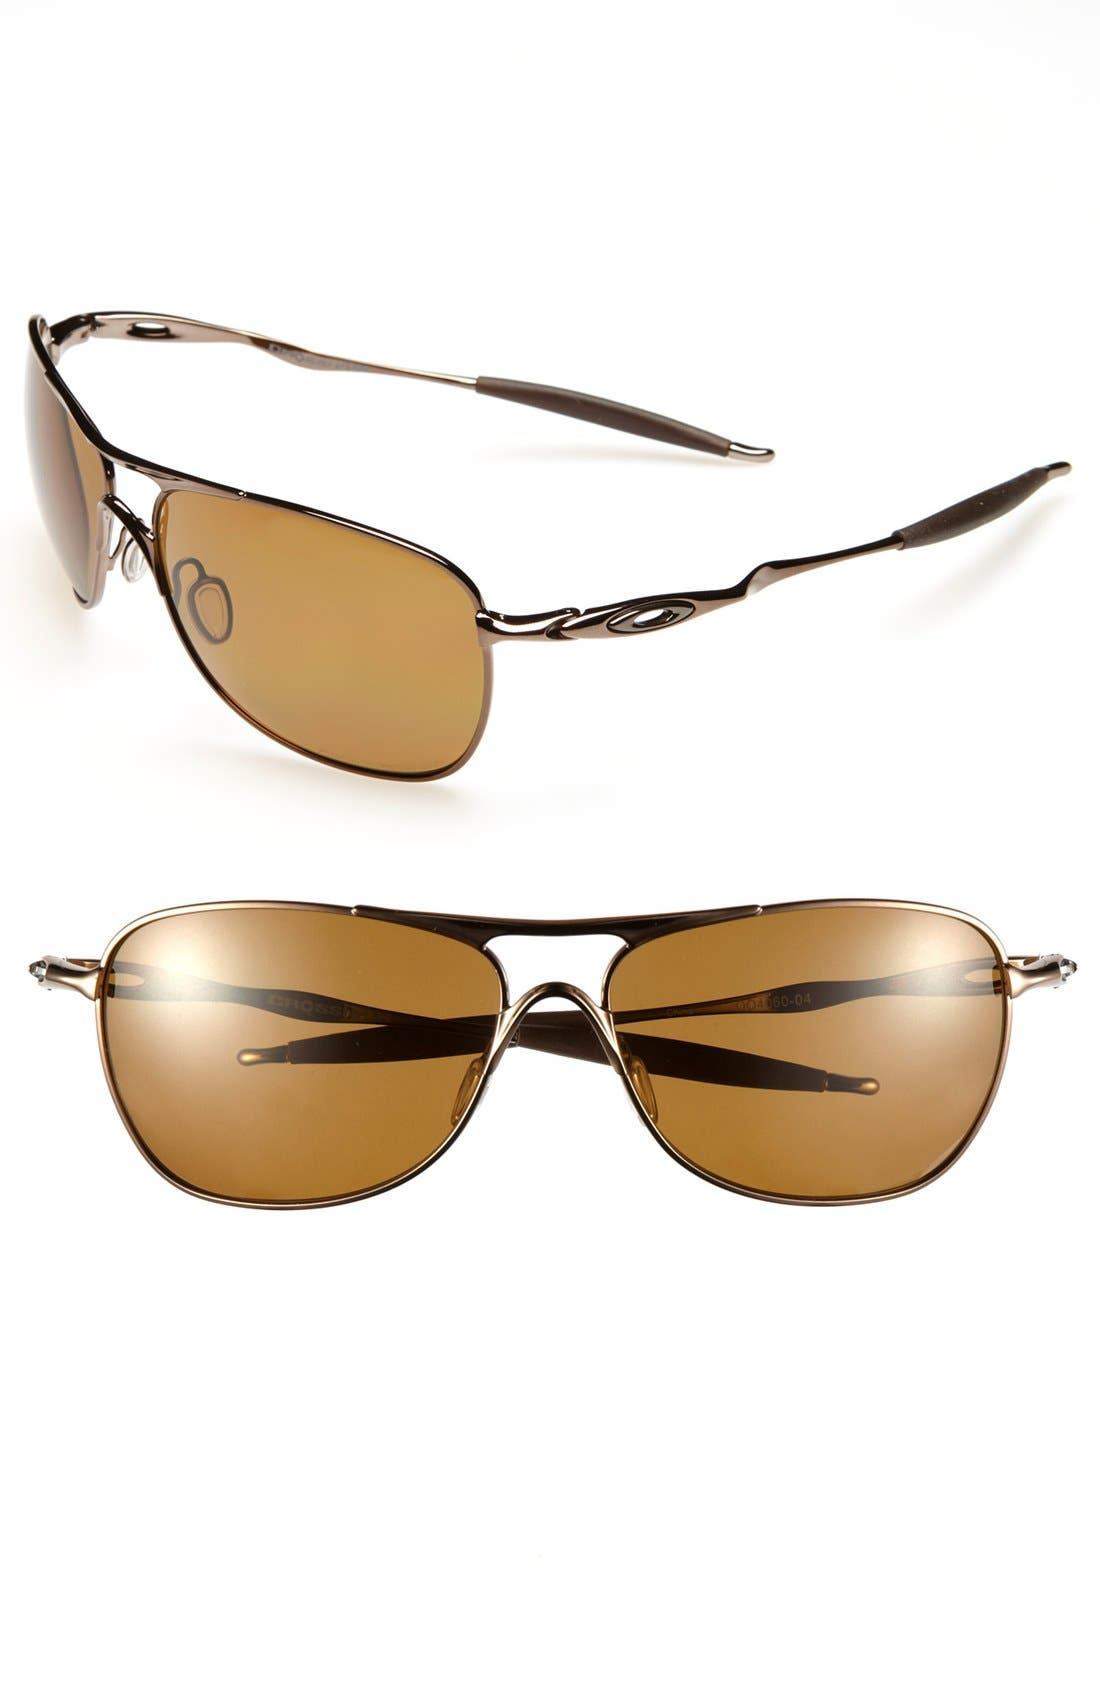 Main Image - Oakley 'Crosshair' 62mm Polarized Sunglasses